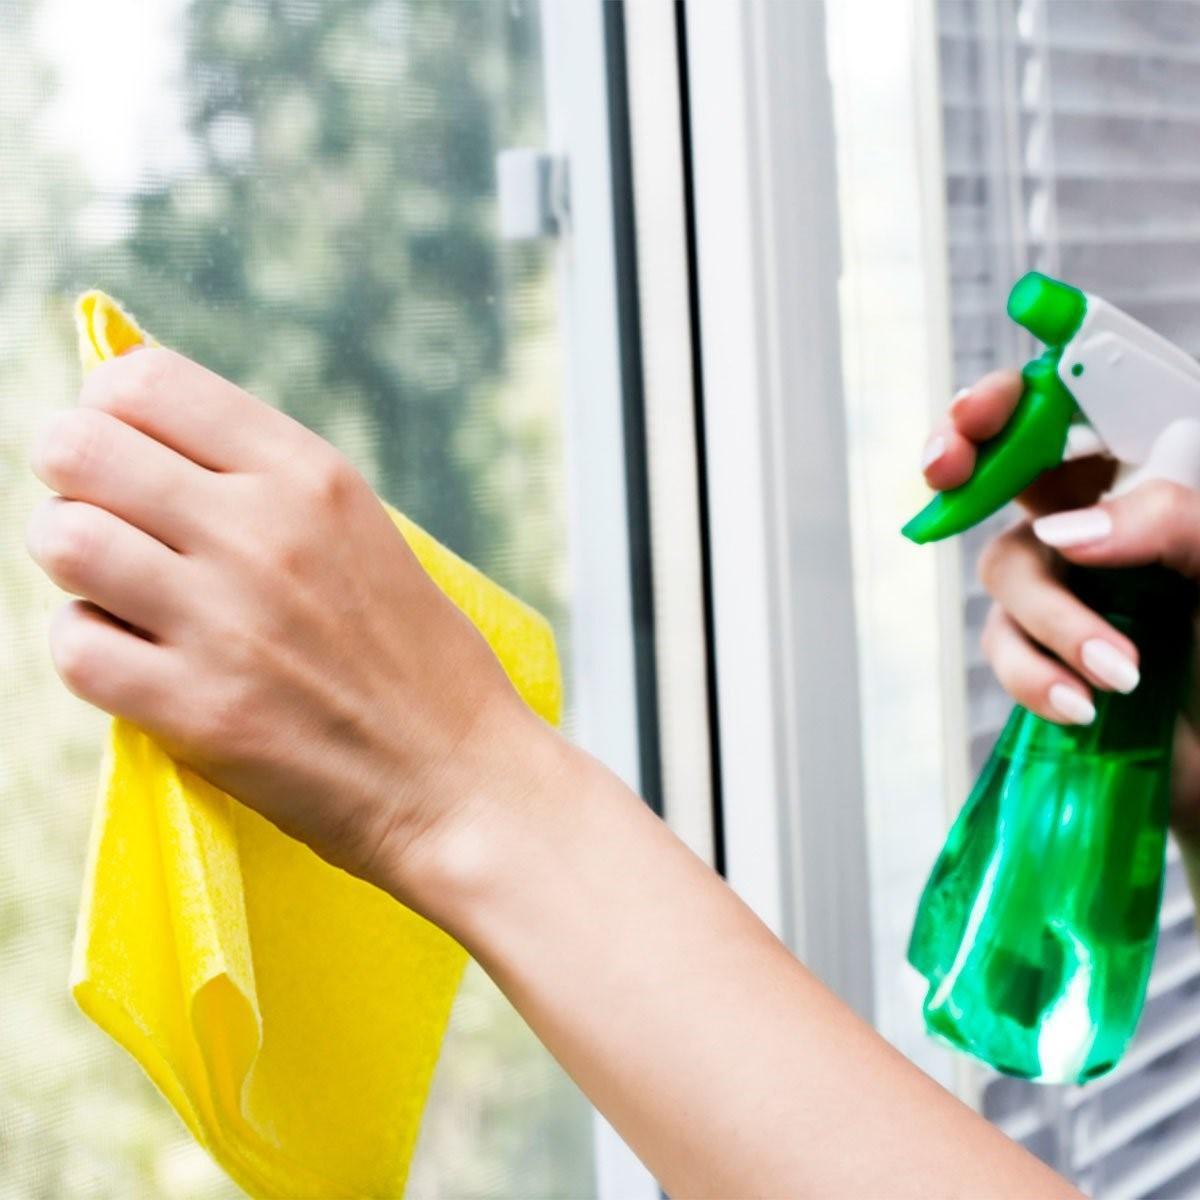 - Homemade Window CleanerSpray Bottle½ cup of white vinegar1 tbsp cornstarch2 cups of waterLemon essential oilGrapefruit essential oil